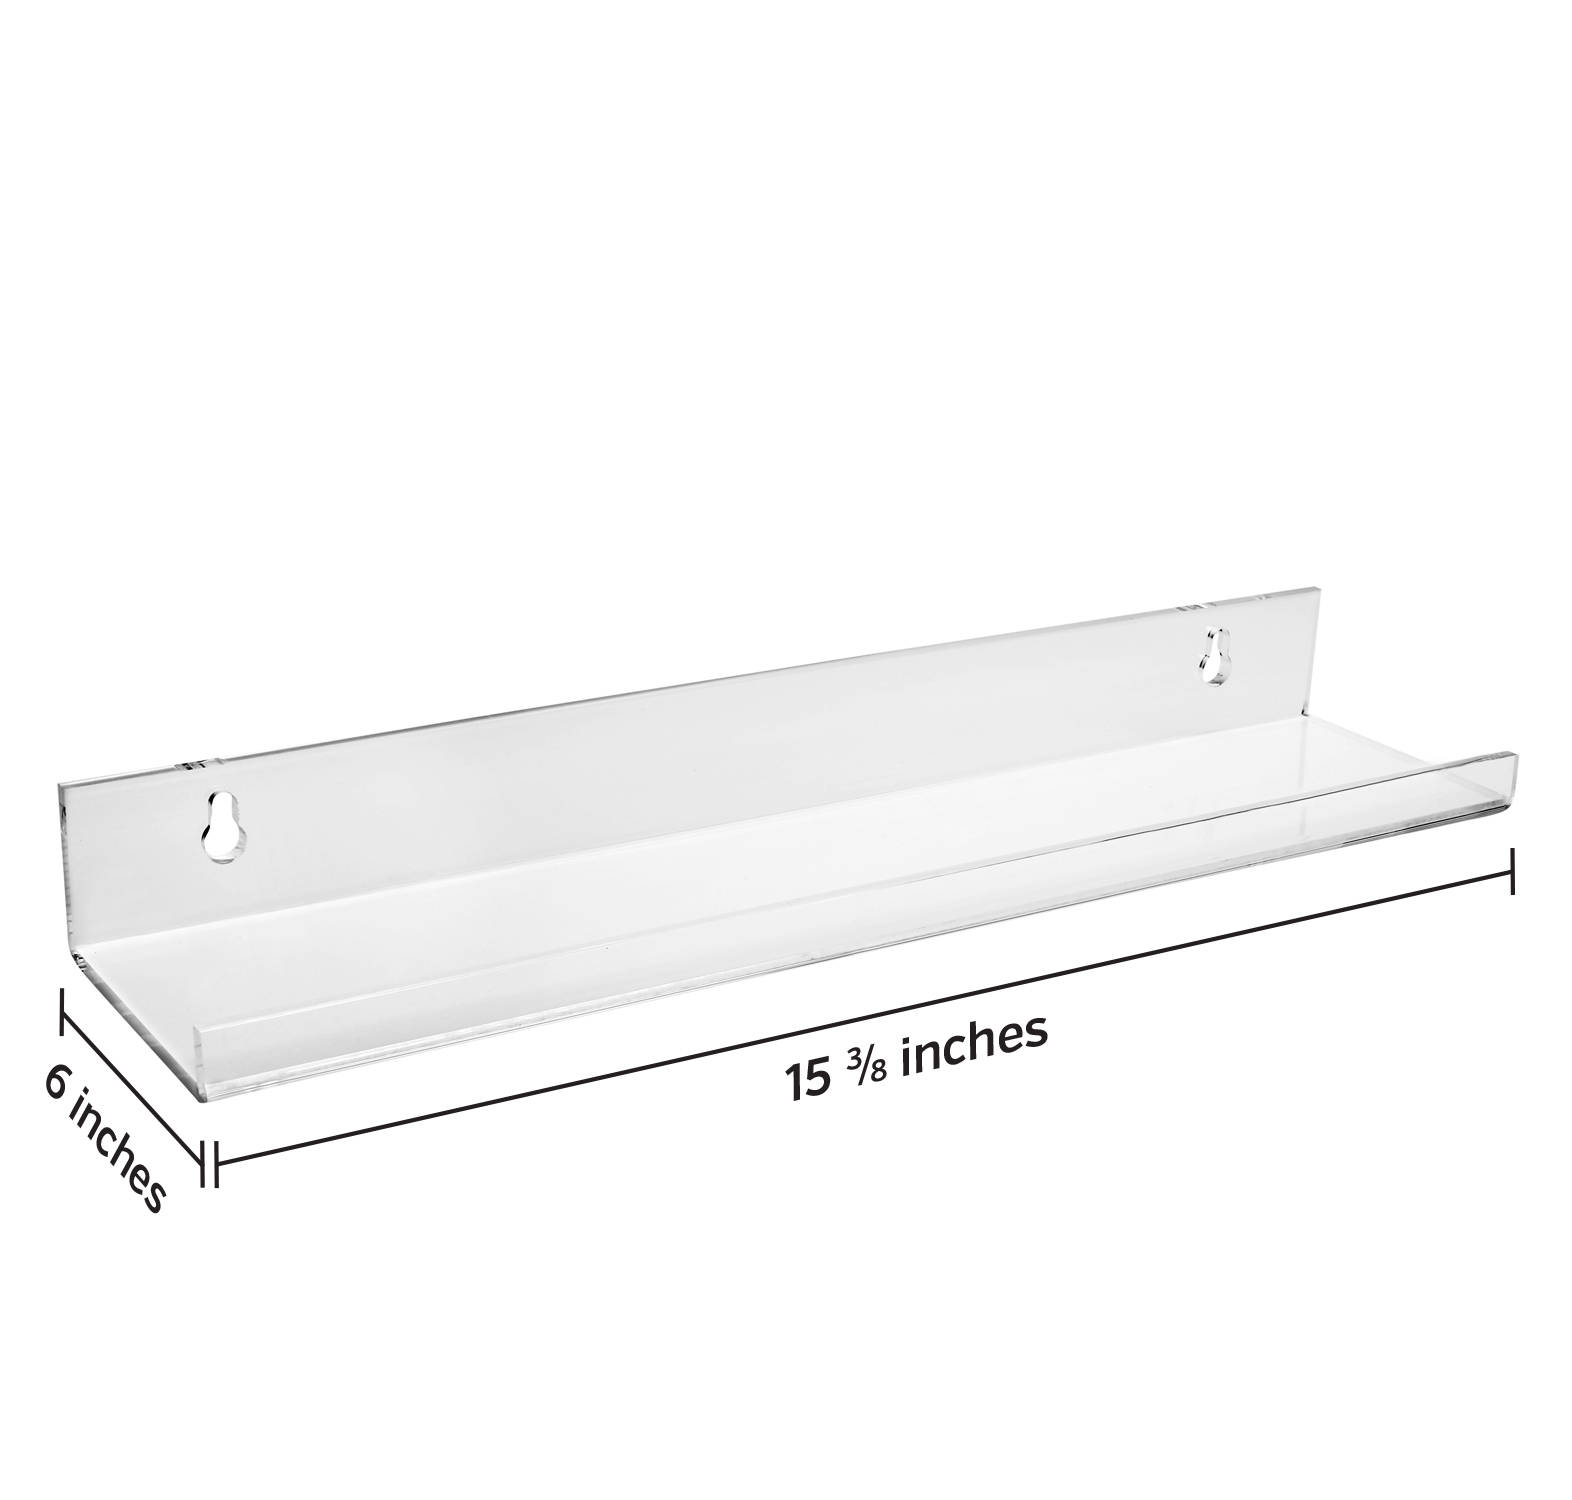 Set of 2 My Charity Boxes Acrylic Wall Mounting Bathroom Shelves 15 x 3 inch Display Shelving